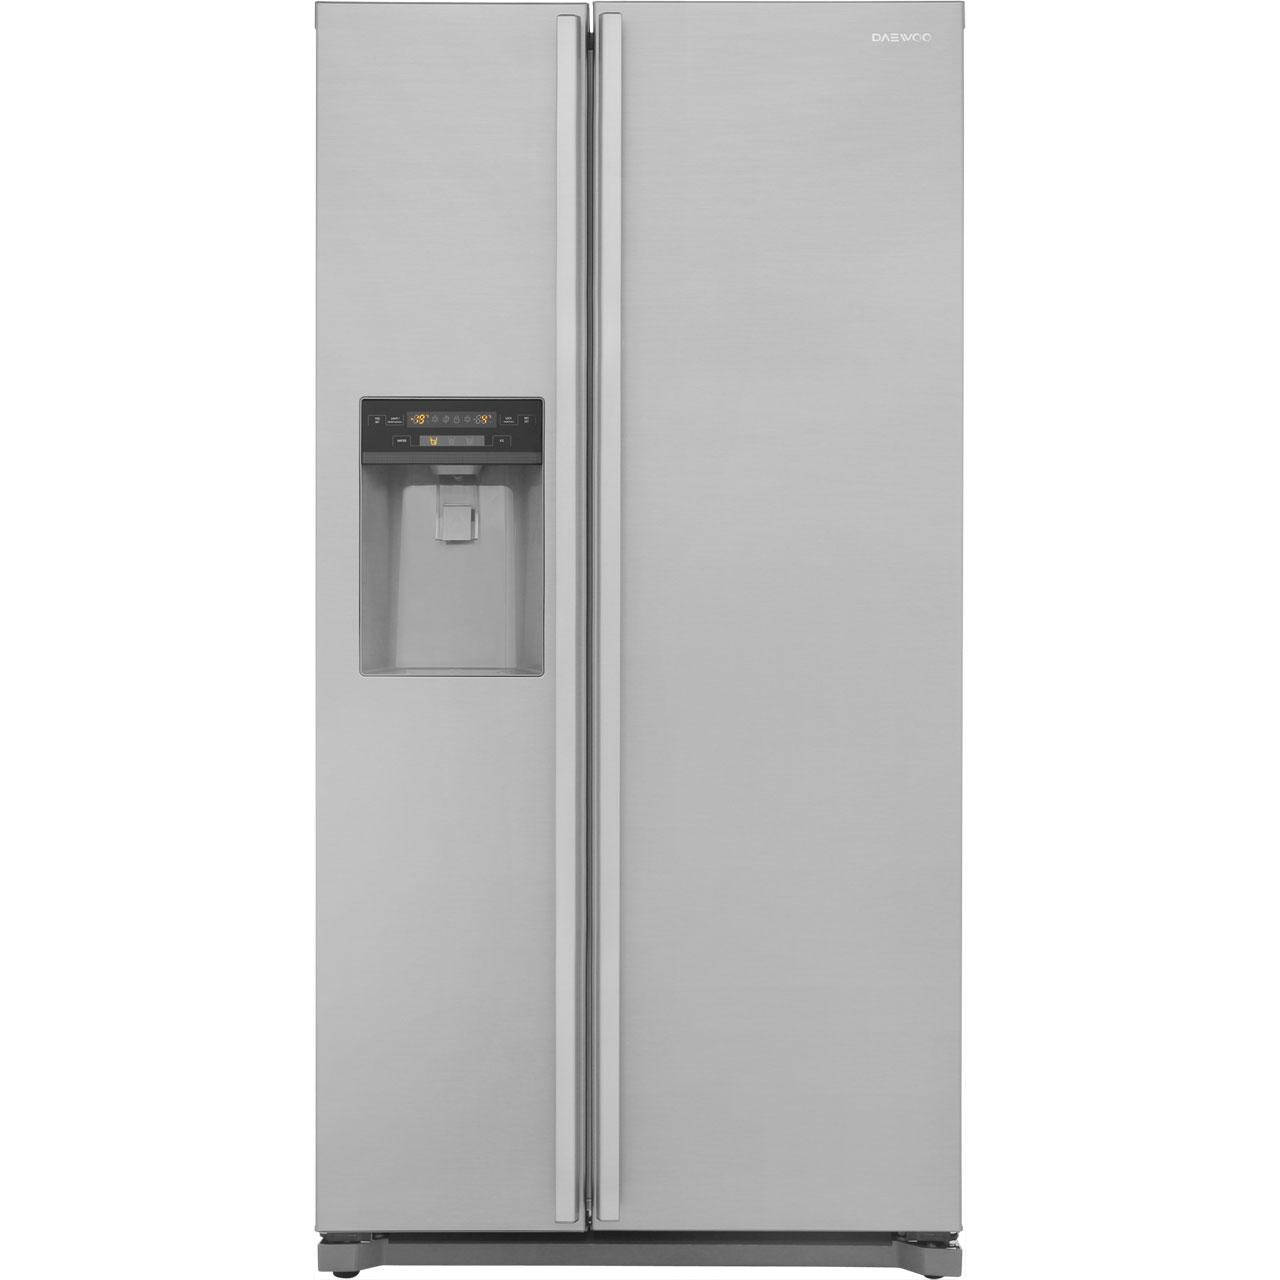 daewoo frax22d3s fridge freezer appliance spotter. Black Bedroom Furniture Sets. Home Design Ideas